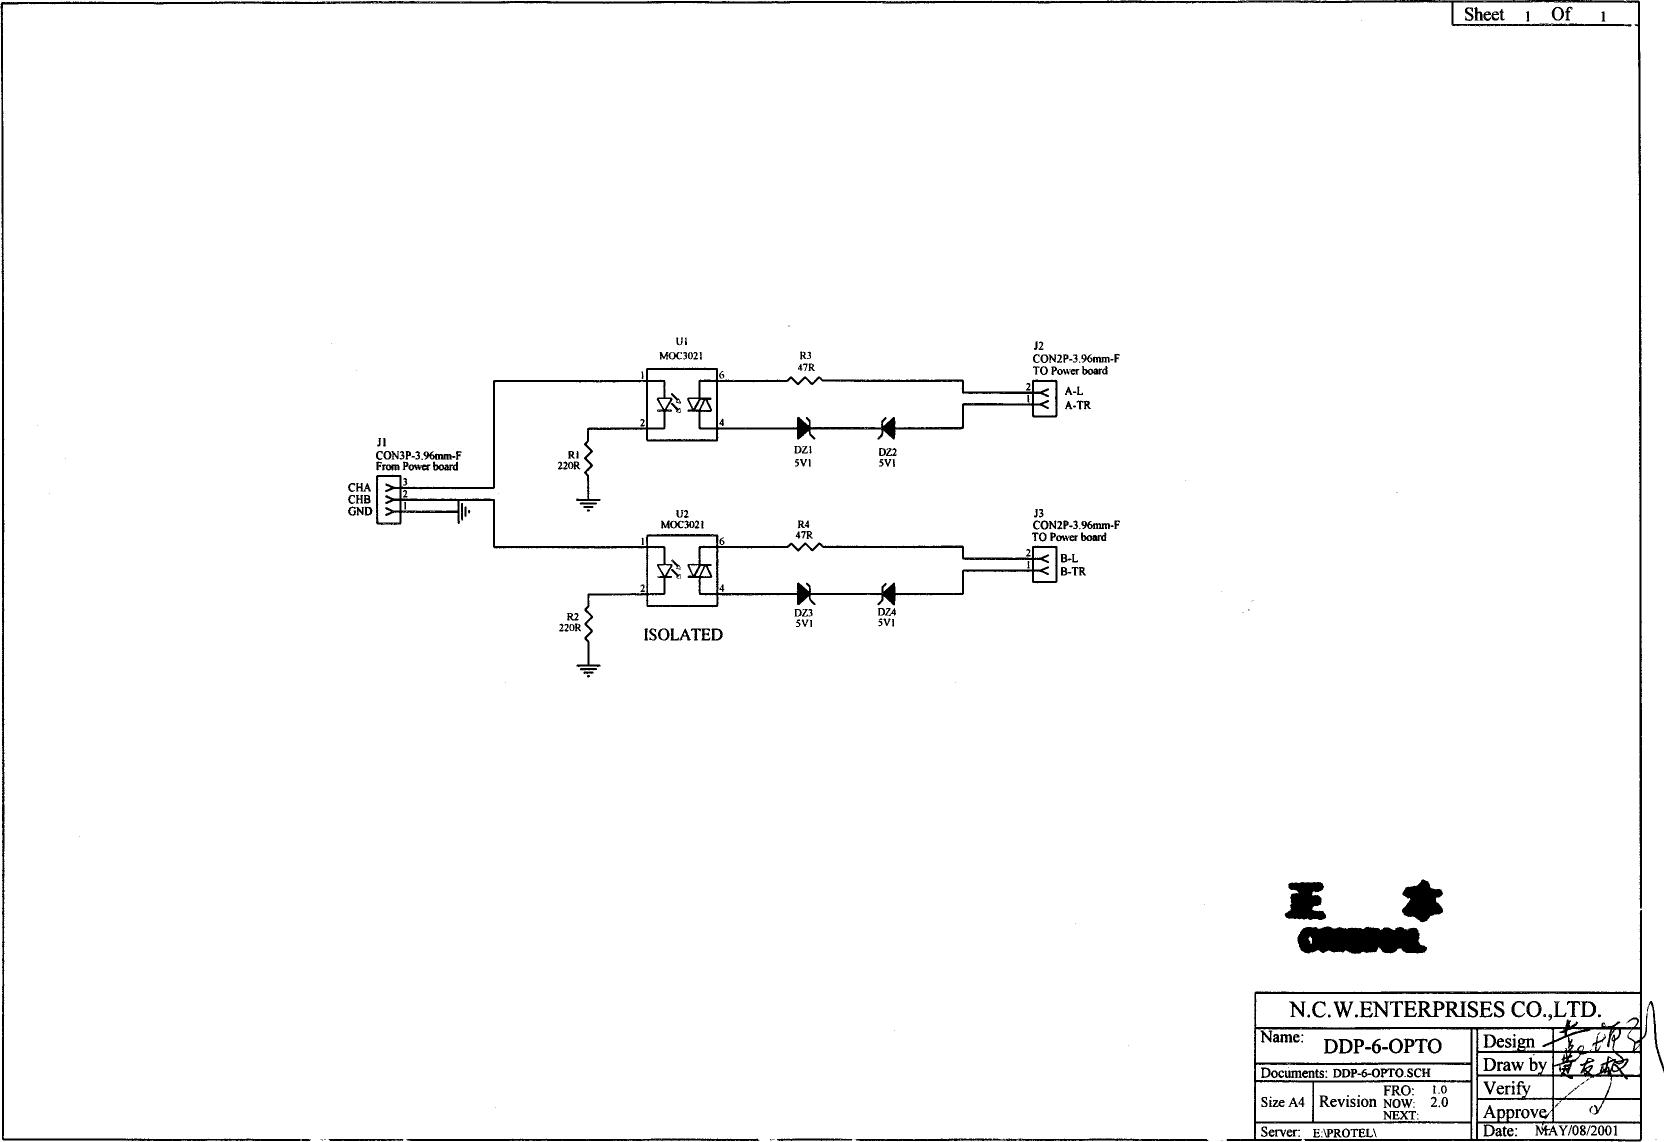 Diagram Profibus Dp Wiring Diagram Full Version Hd Quality Wiring Diagram Kkwiring Angelux It